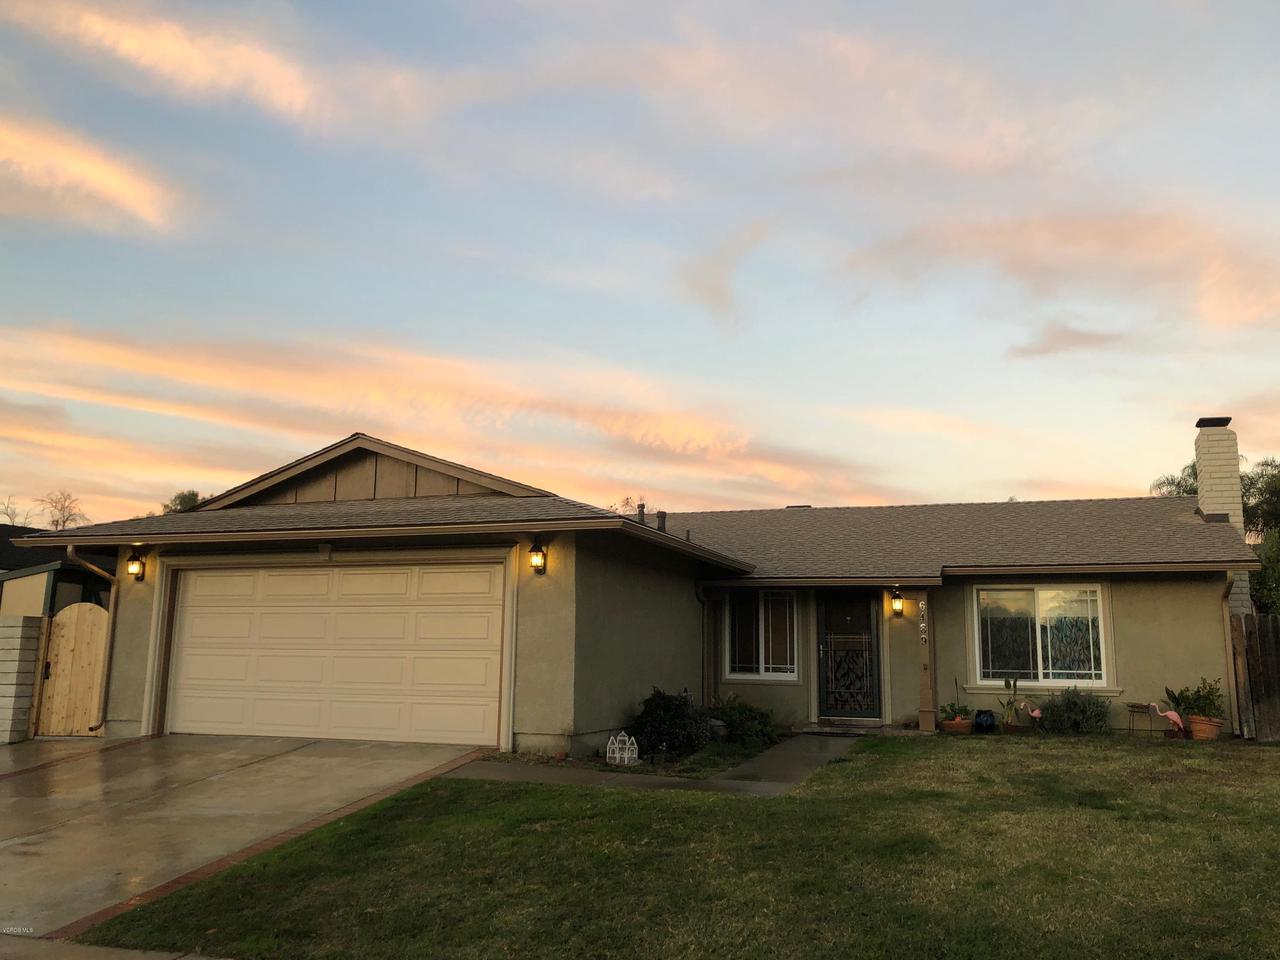 6489 DUKE, Moorpark, CA 93021 - A_Home Front 5